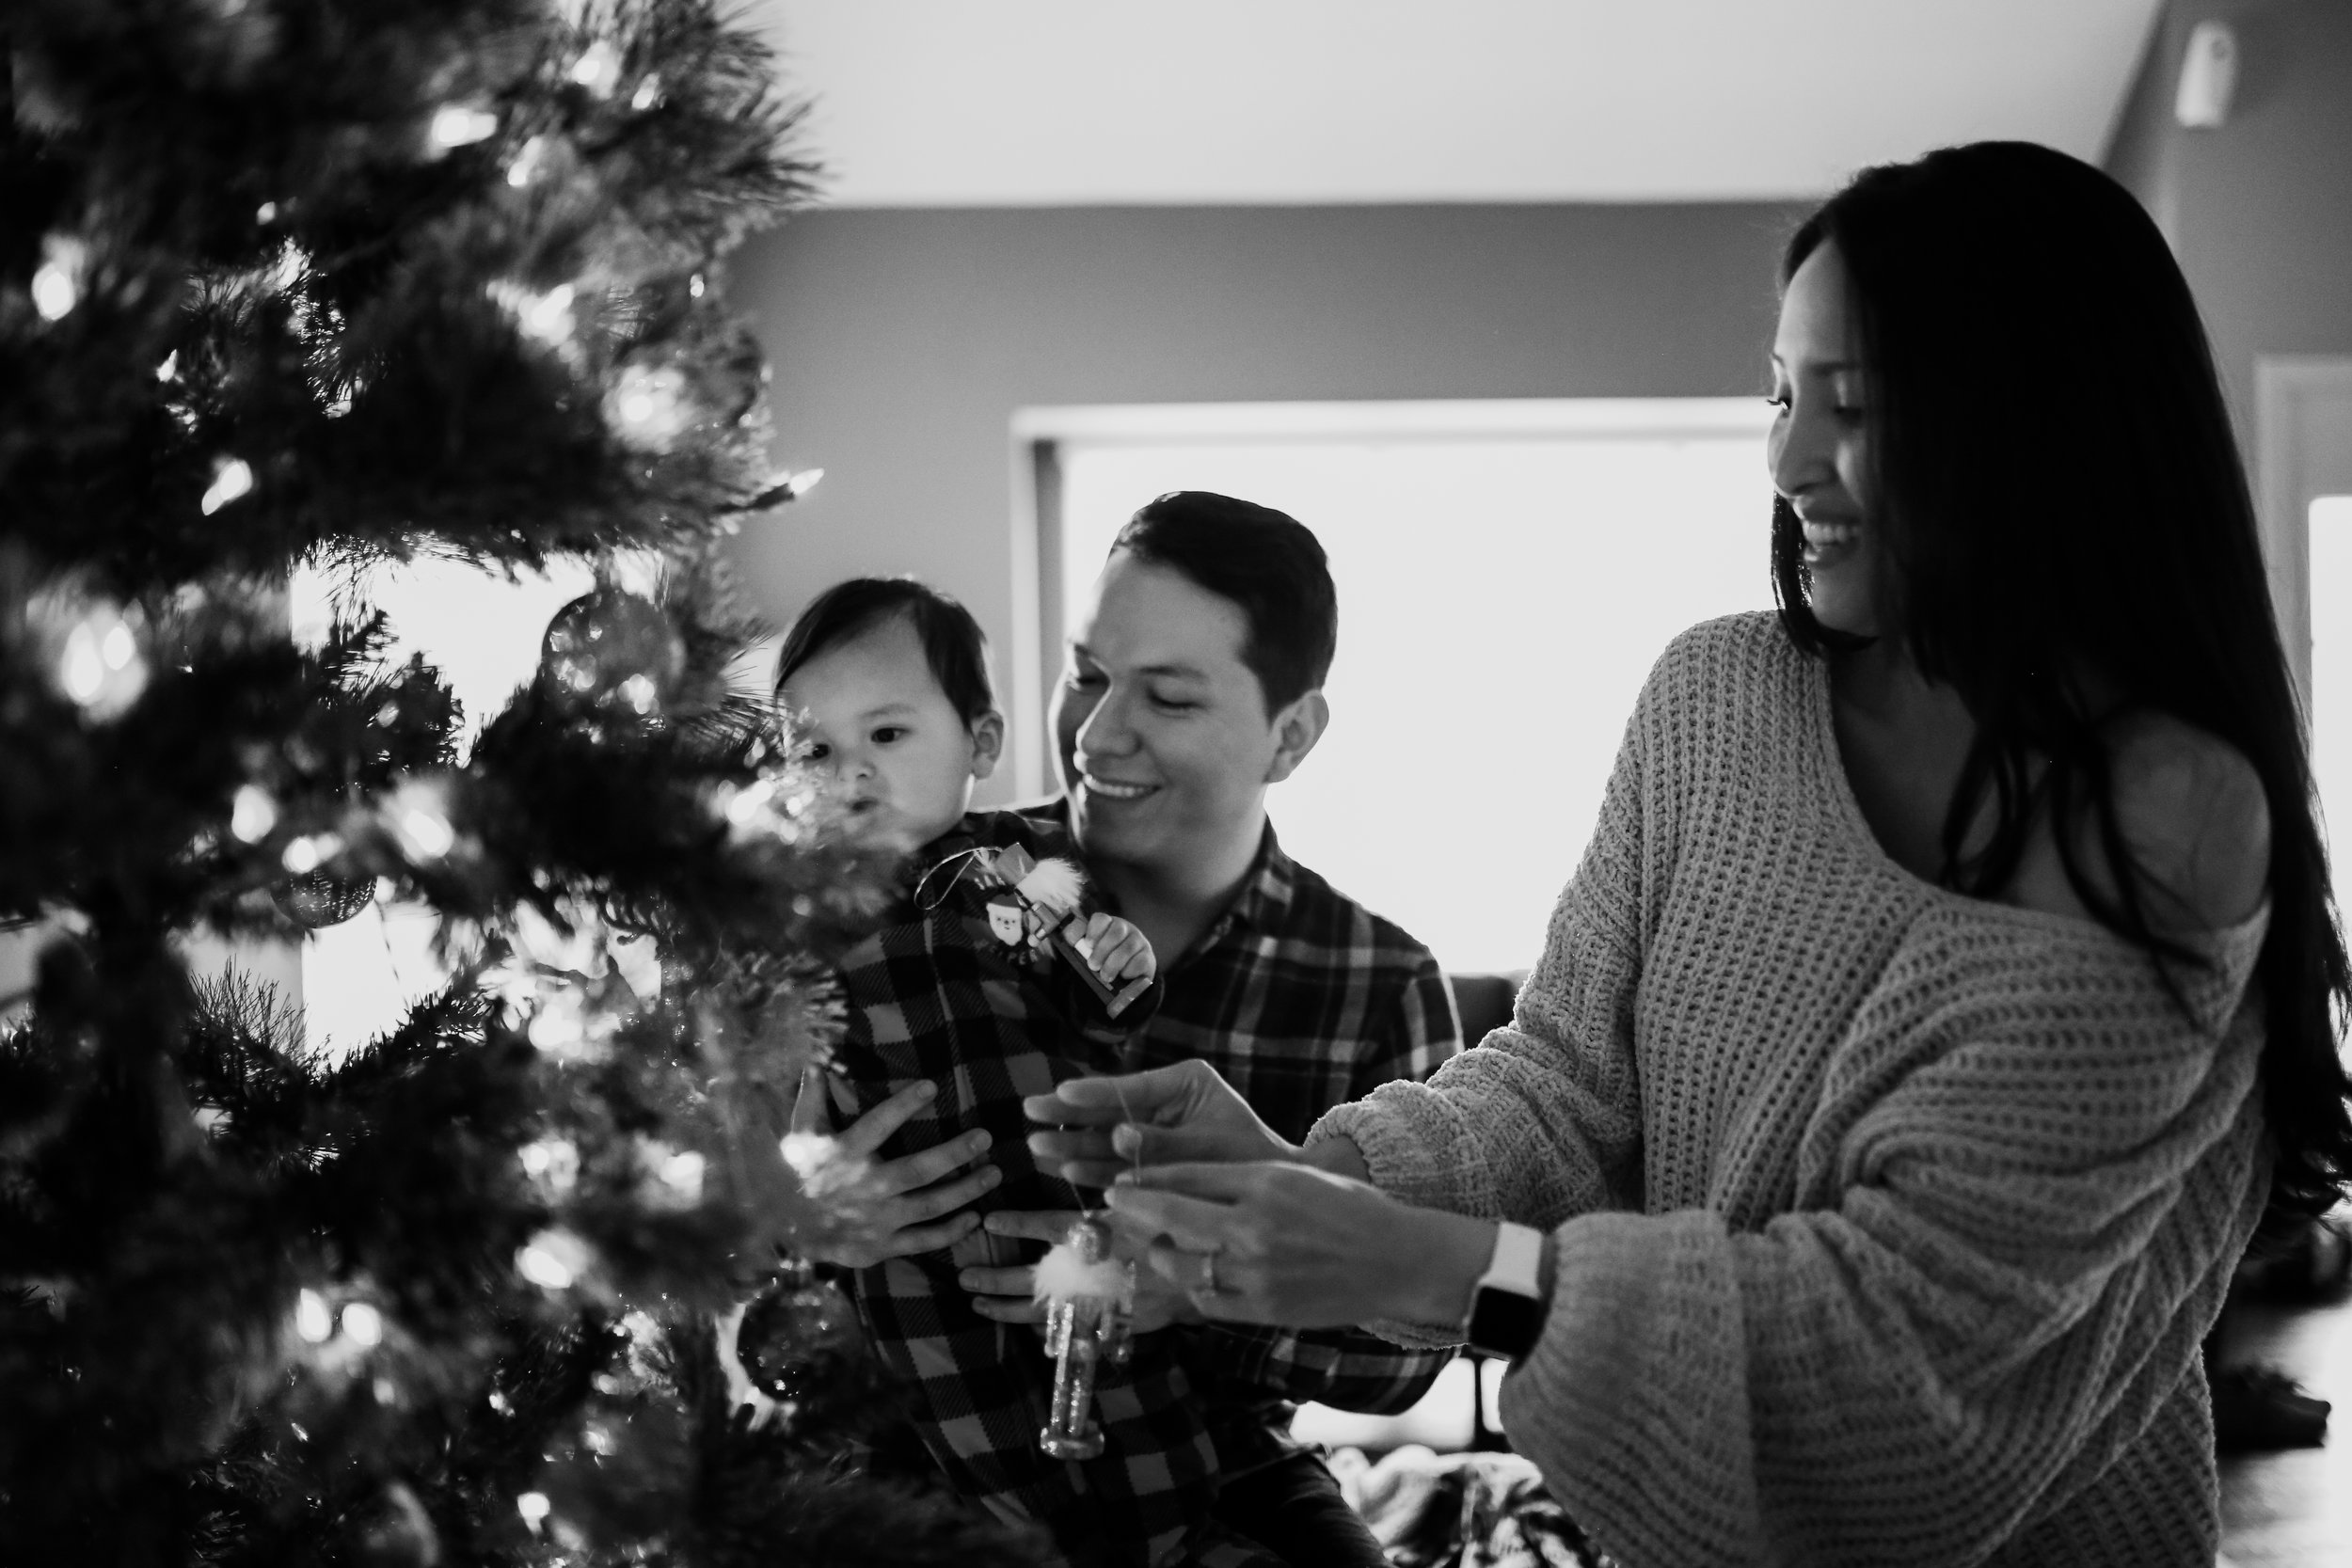 Camacho's_Christmas_2018-99.jpg